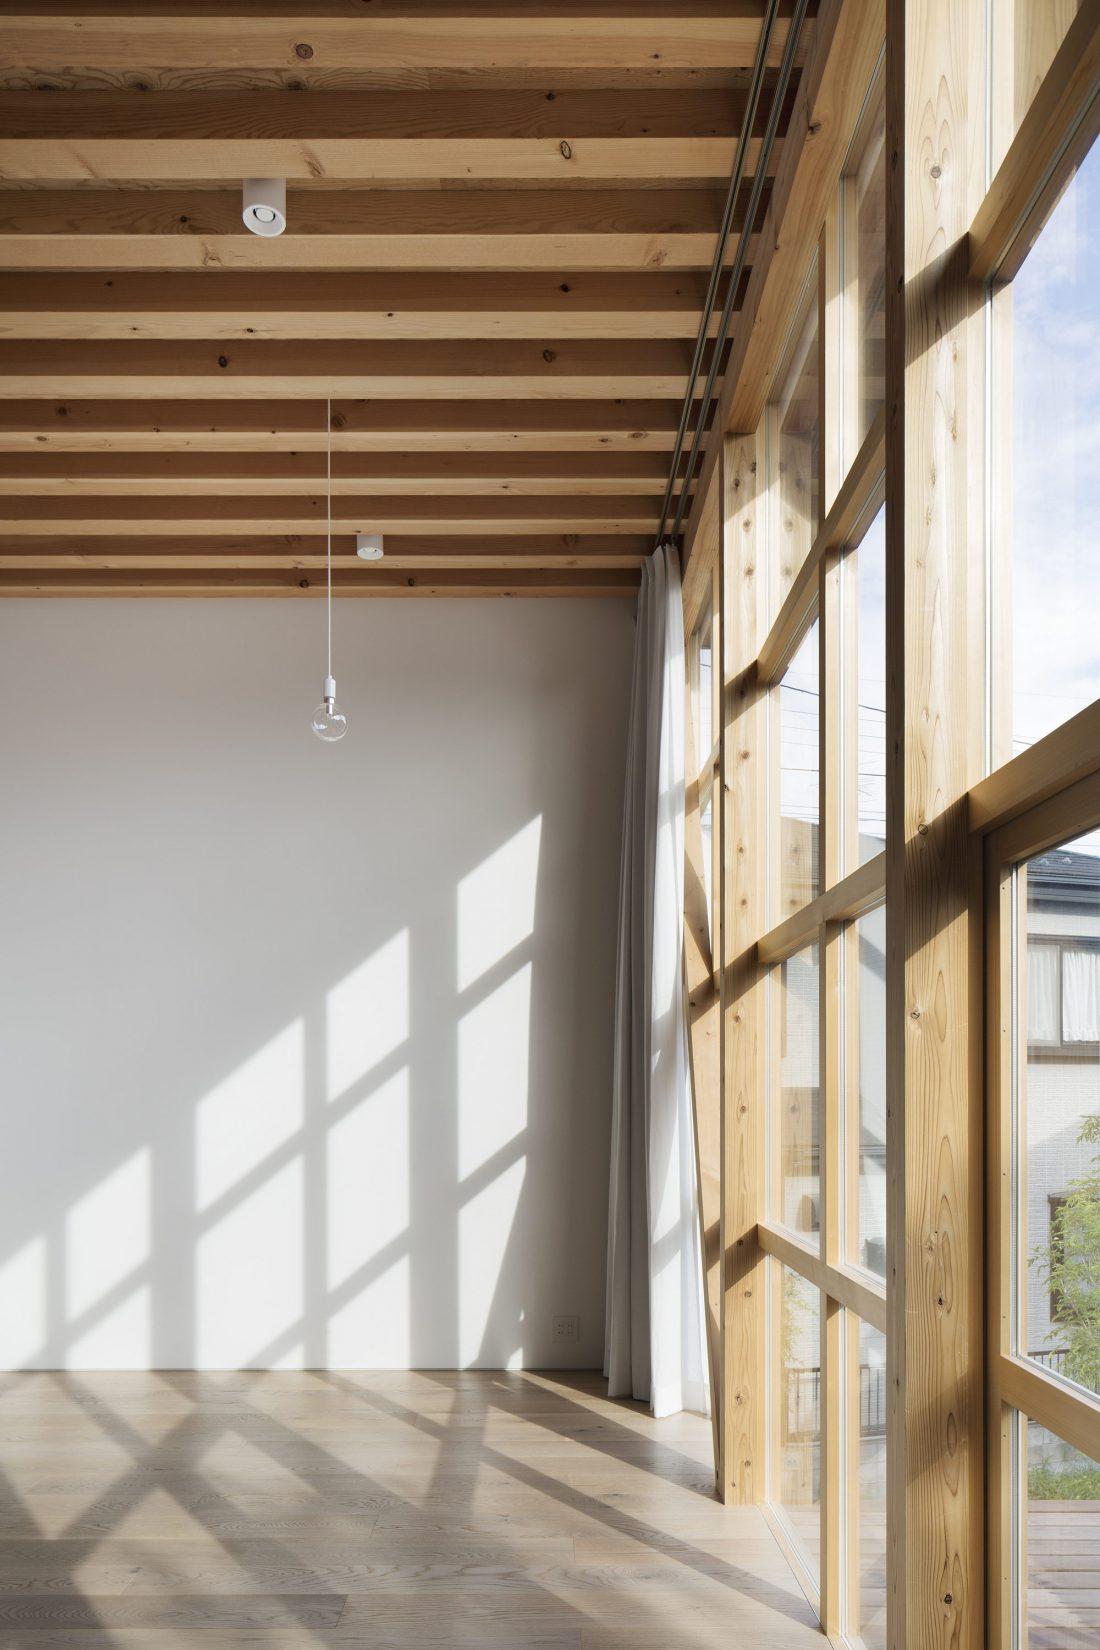 Дом в Токио по системе Shakkanho по проекту Tetsuo Yamaji 13